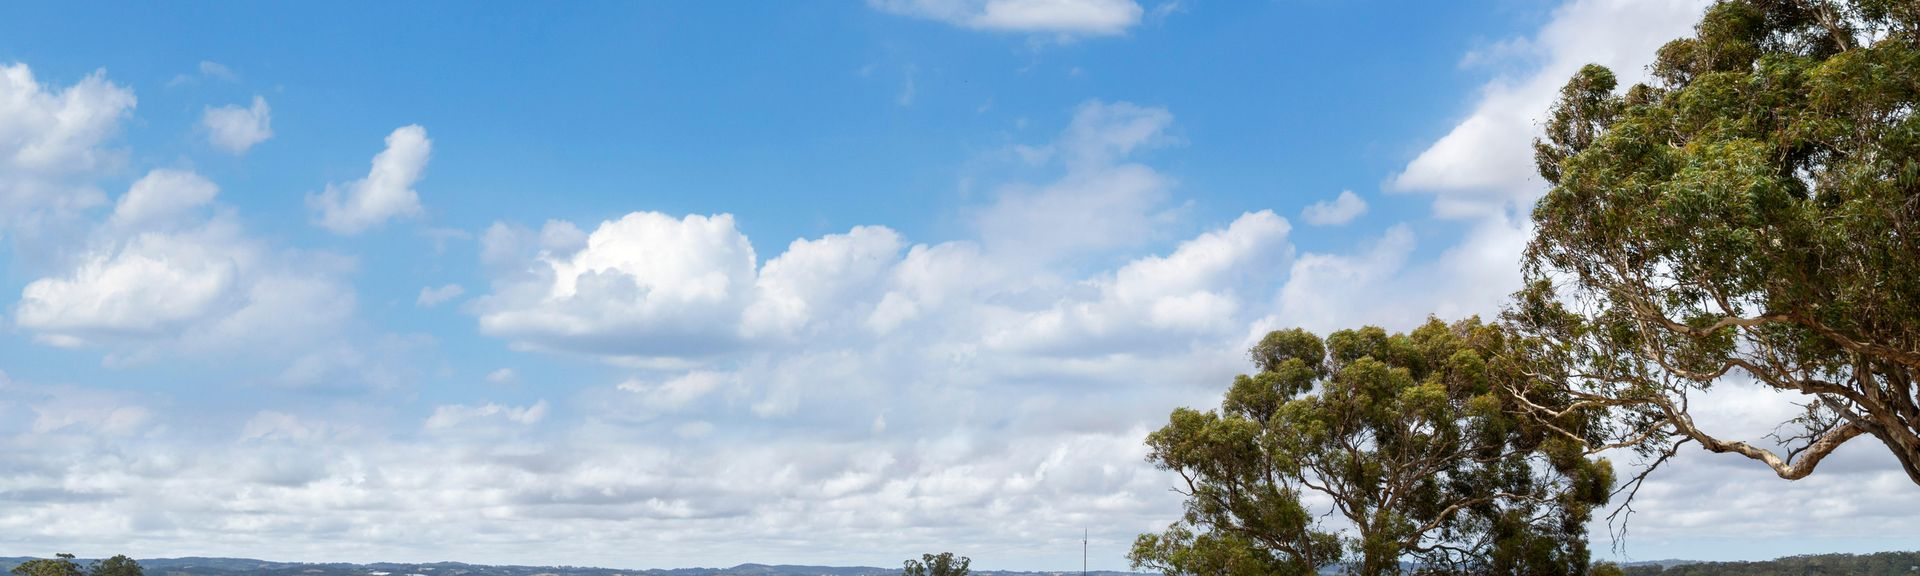 Hahndorf SA, Australia